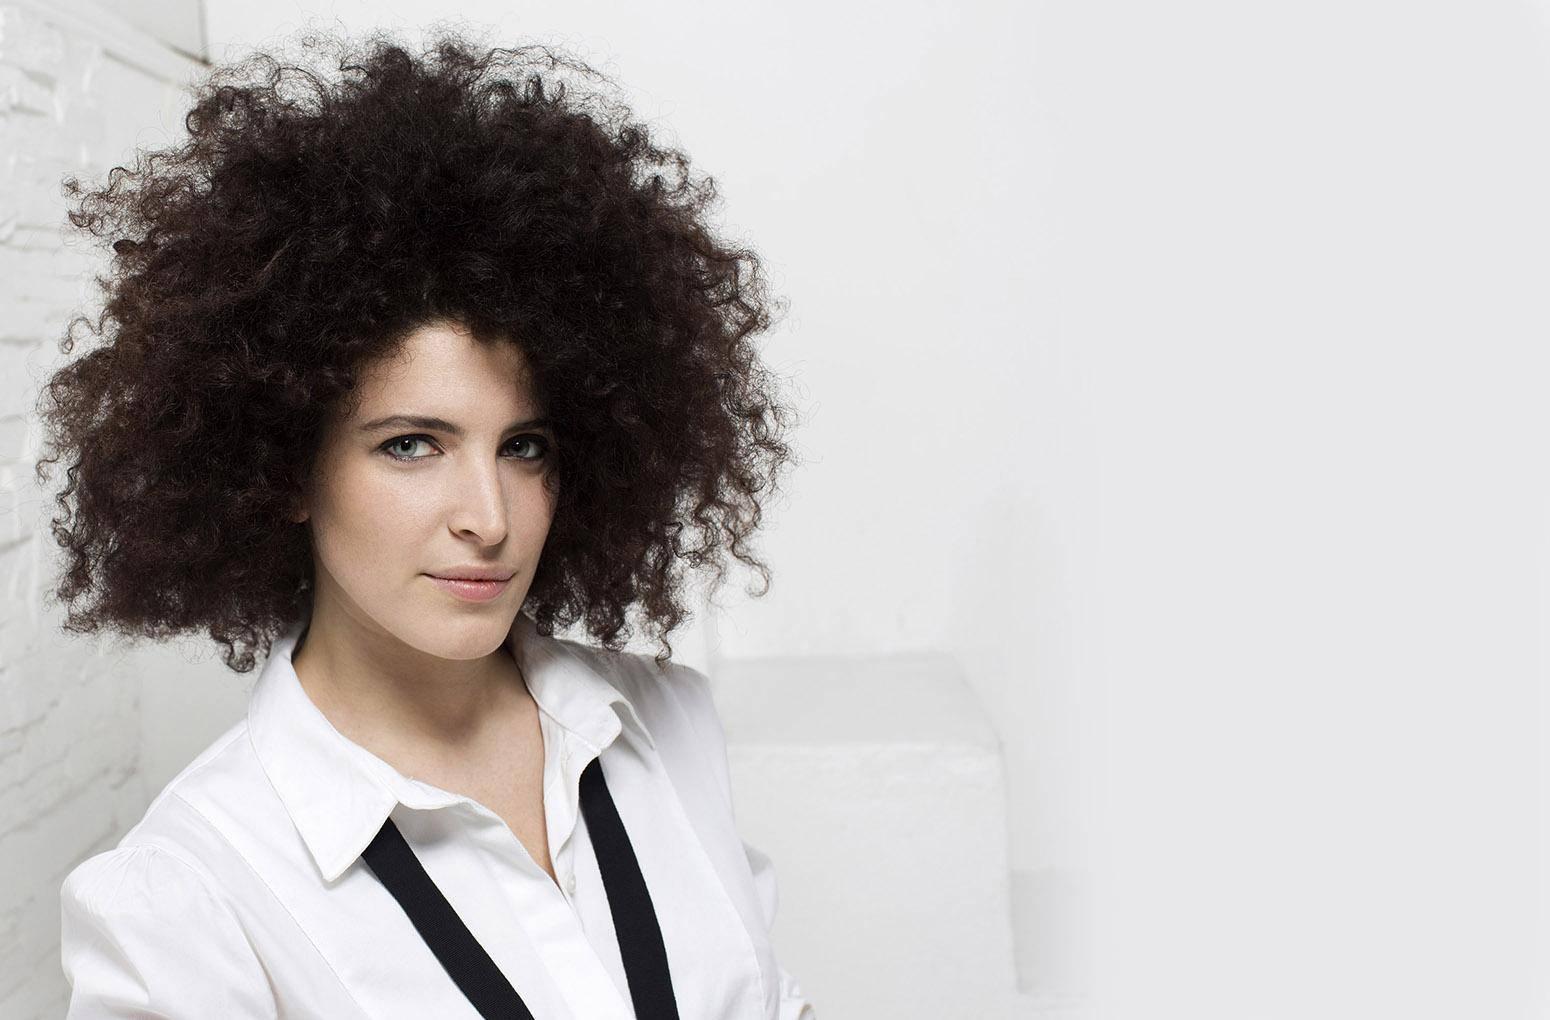 Marianne Mirage, chi è: vita, carriera, curiosità sulla cantautrice